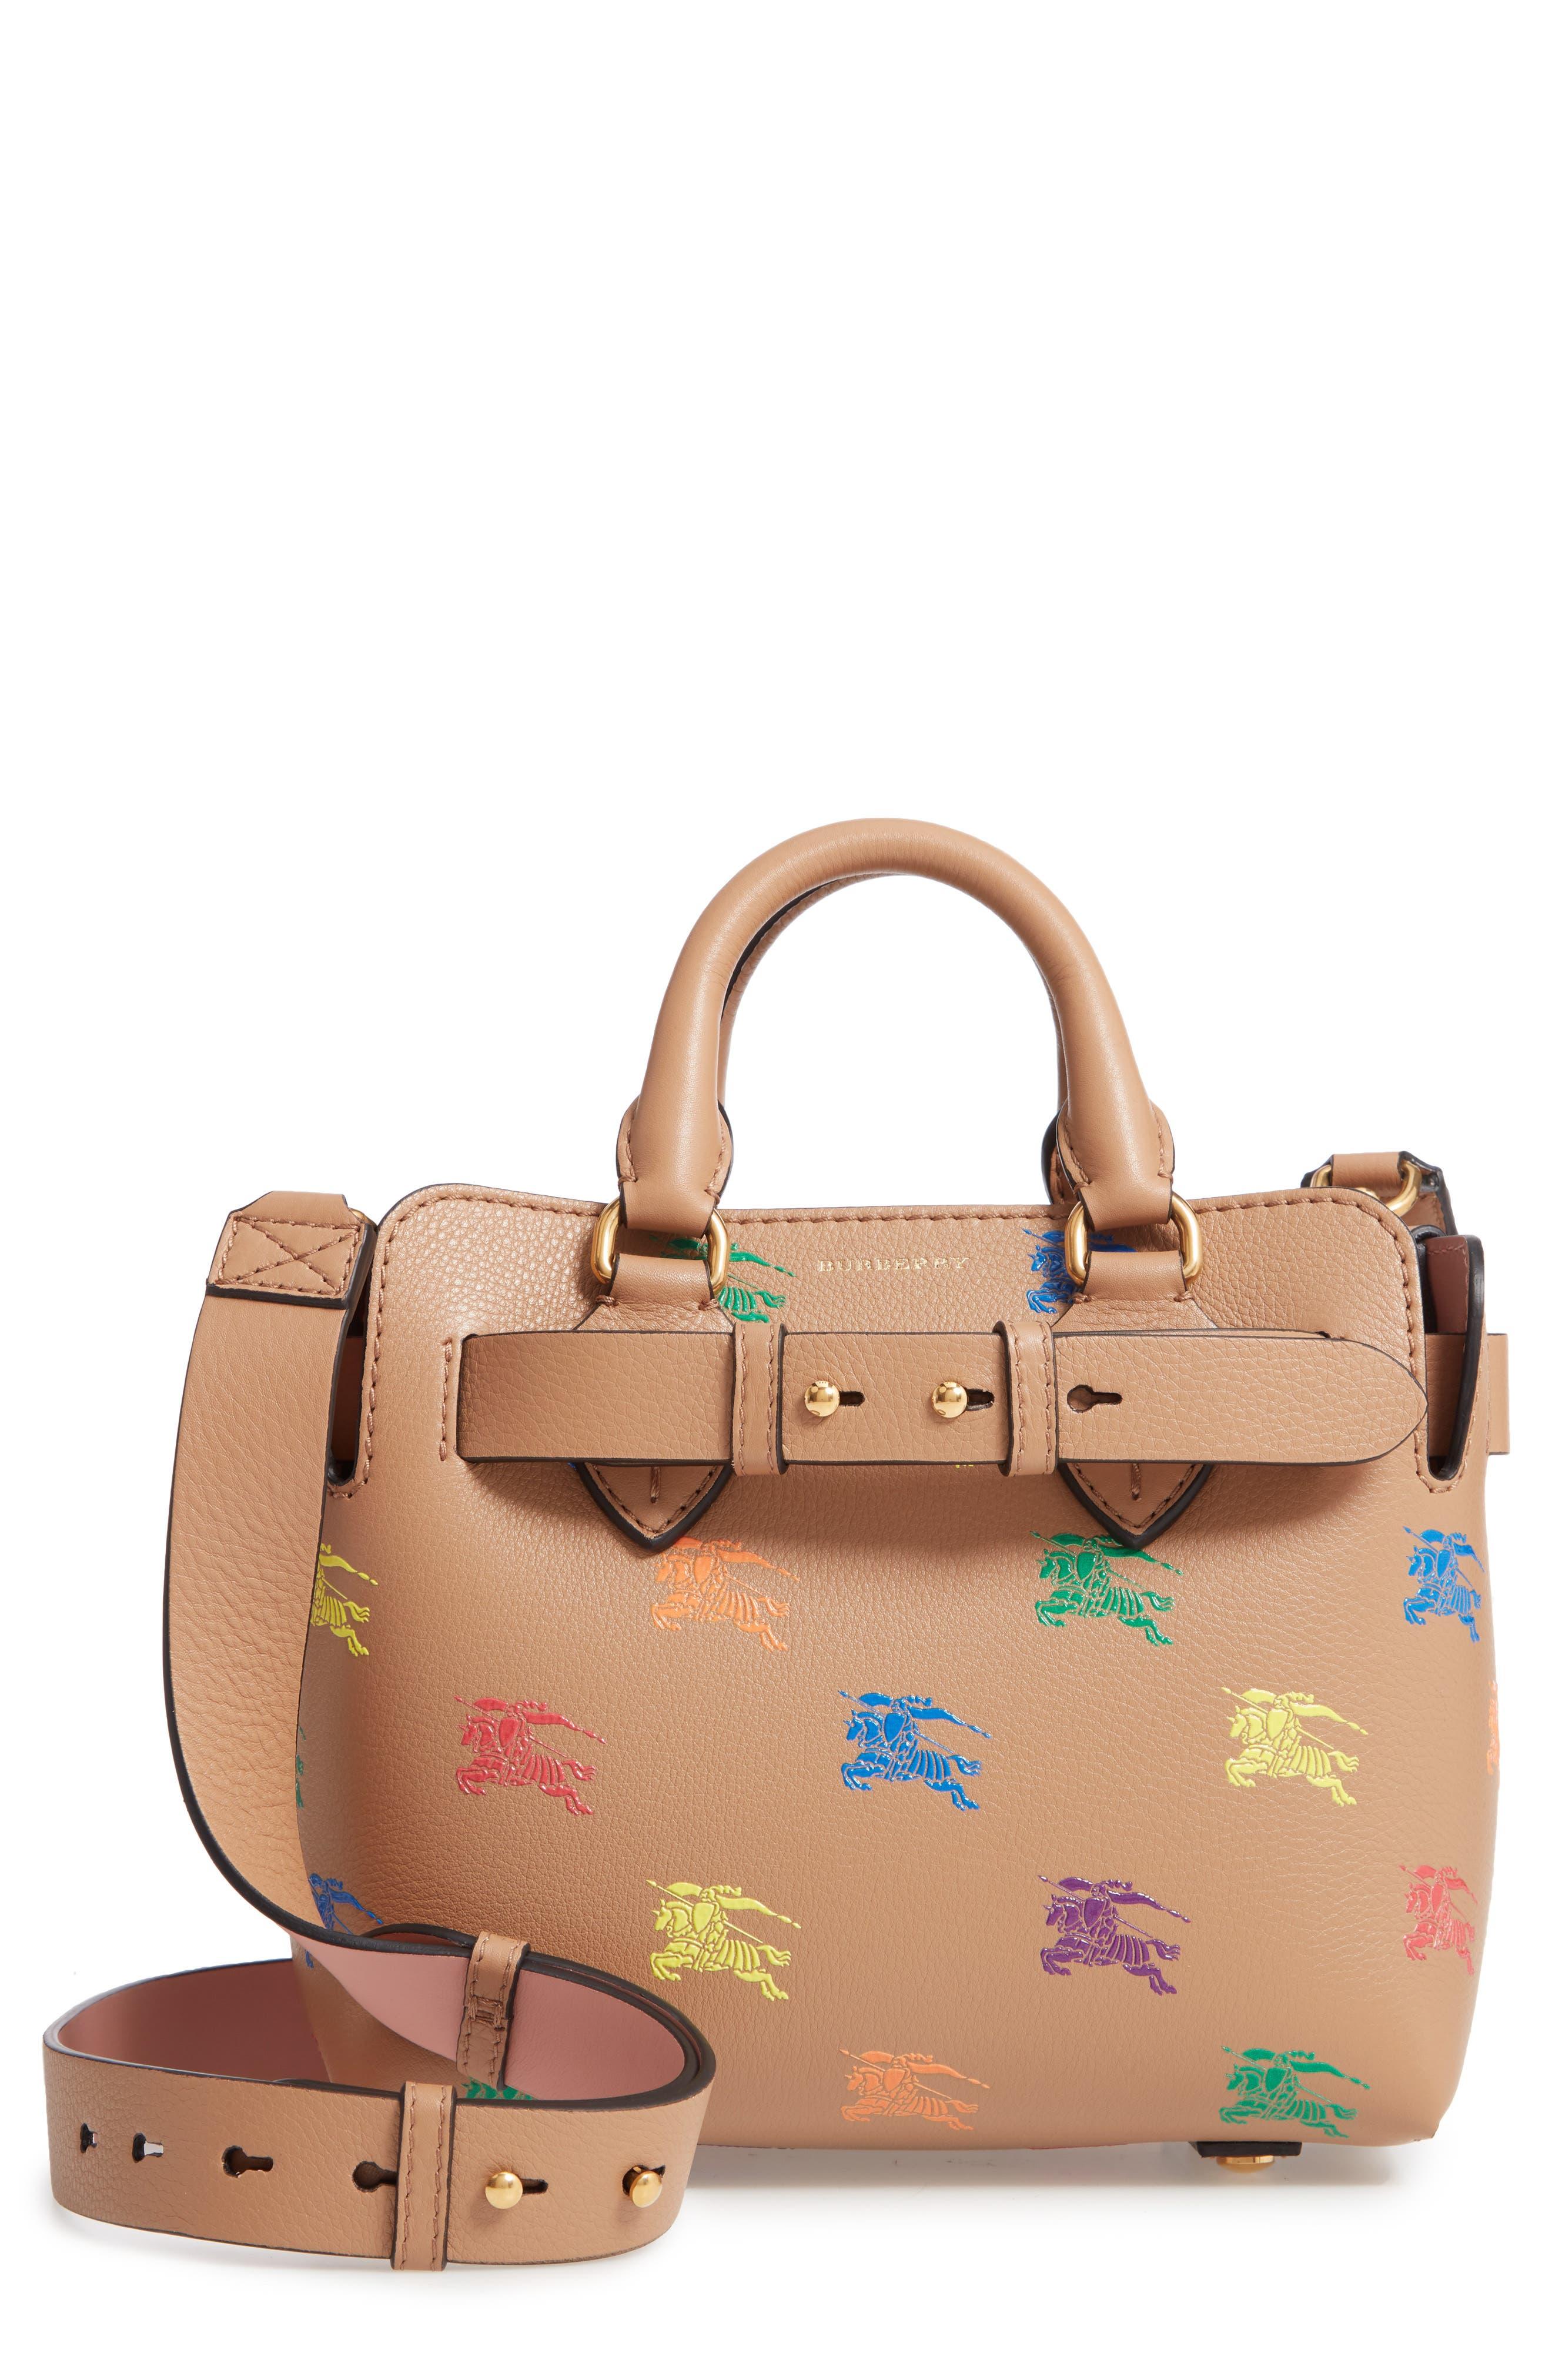 Baby Belt Bag Rainbow Logo Leather Tote,                         Main,                         color, LIGHT CAMEL